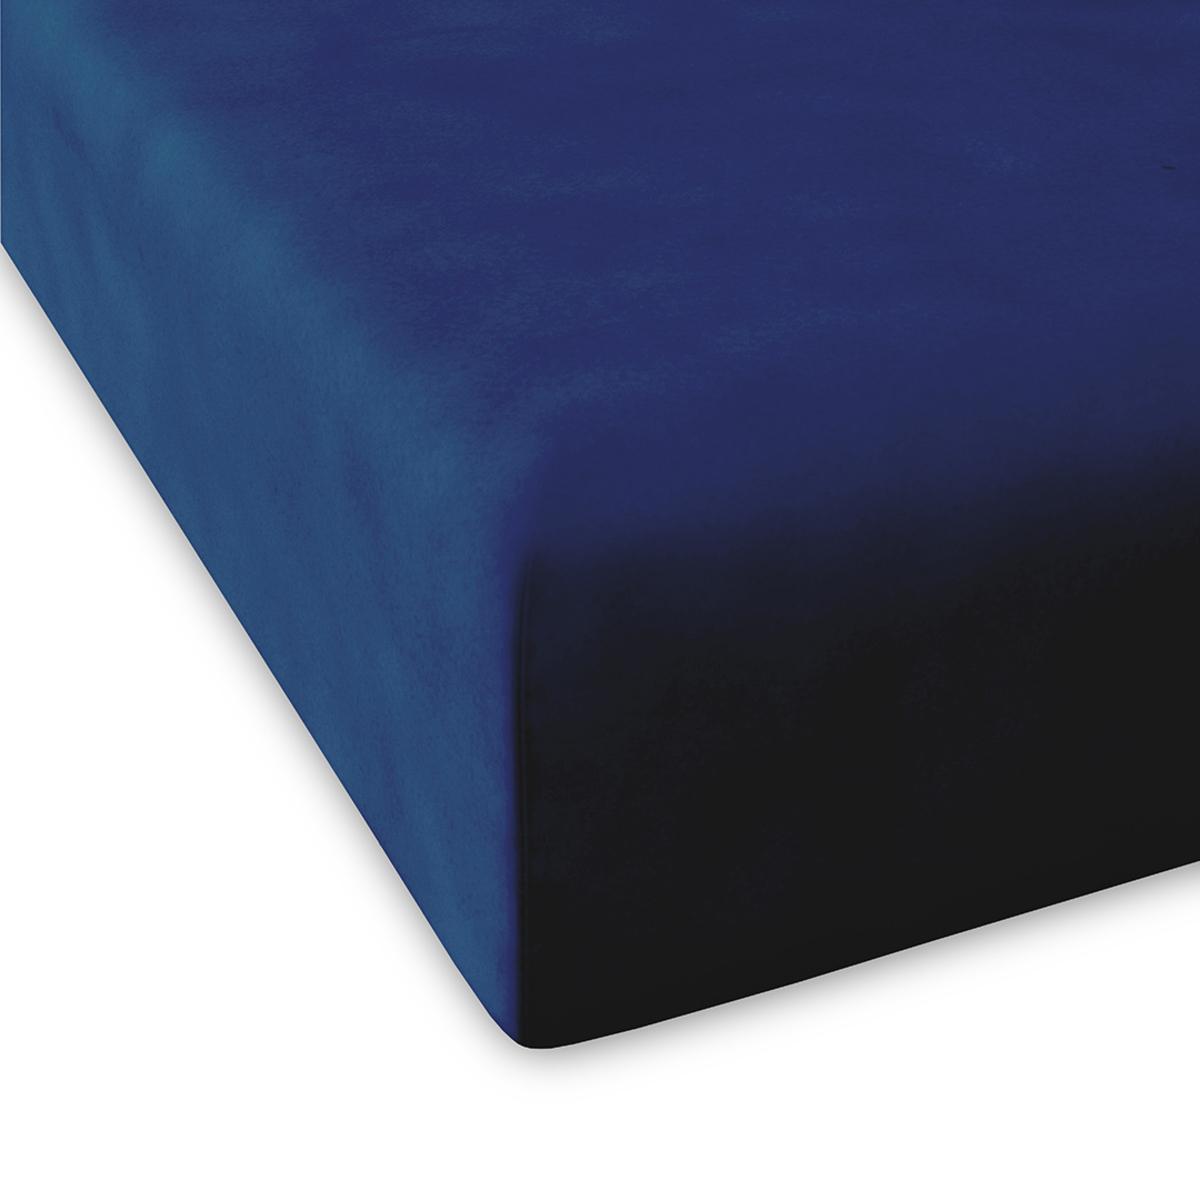 Drap housse en coton bleu marine 200x200